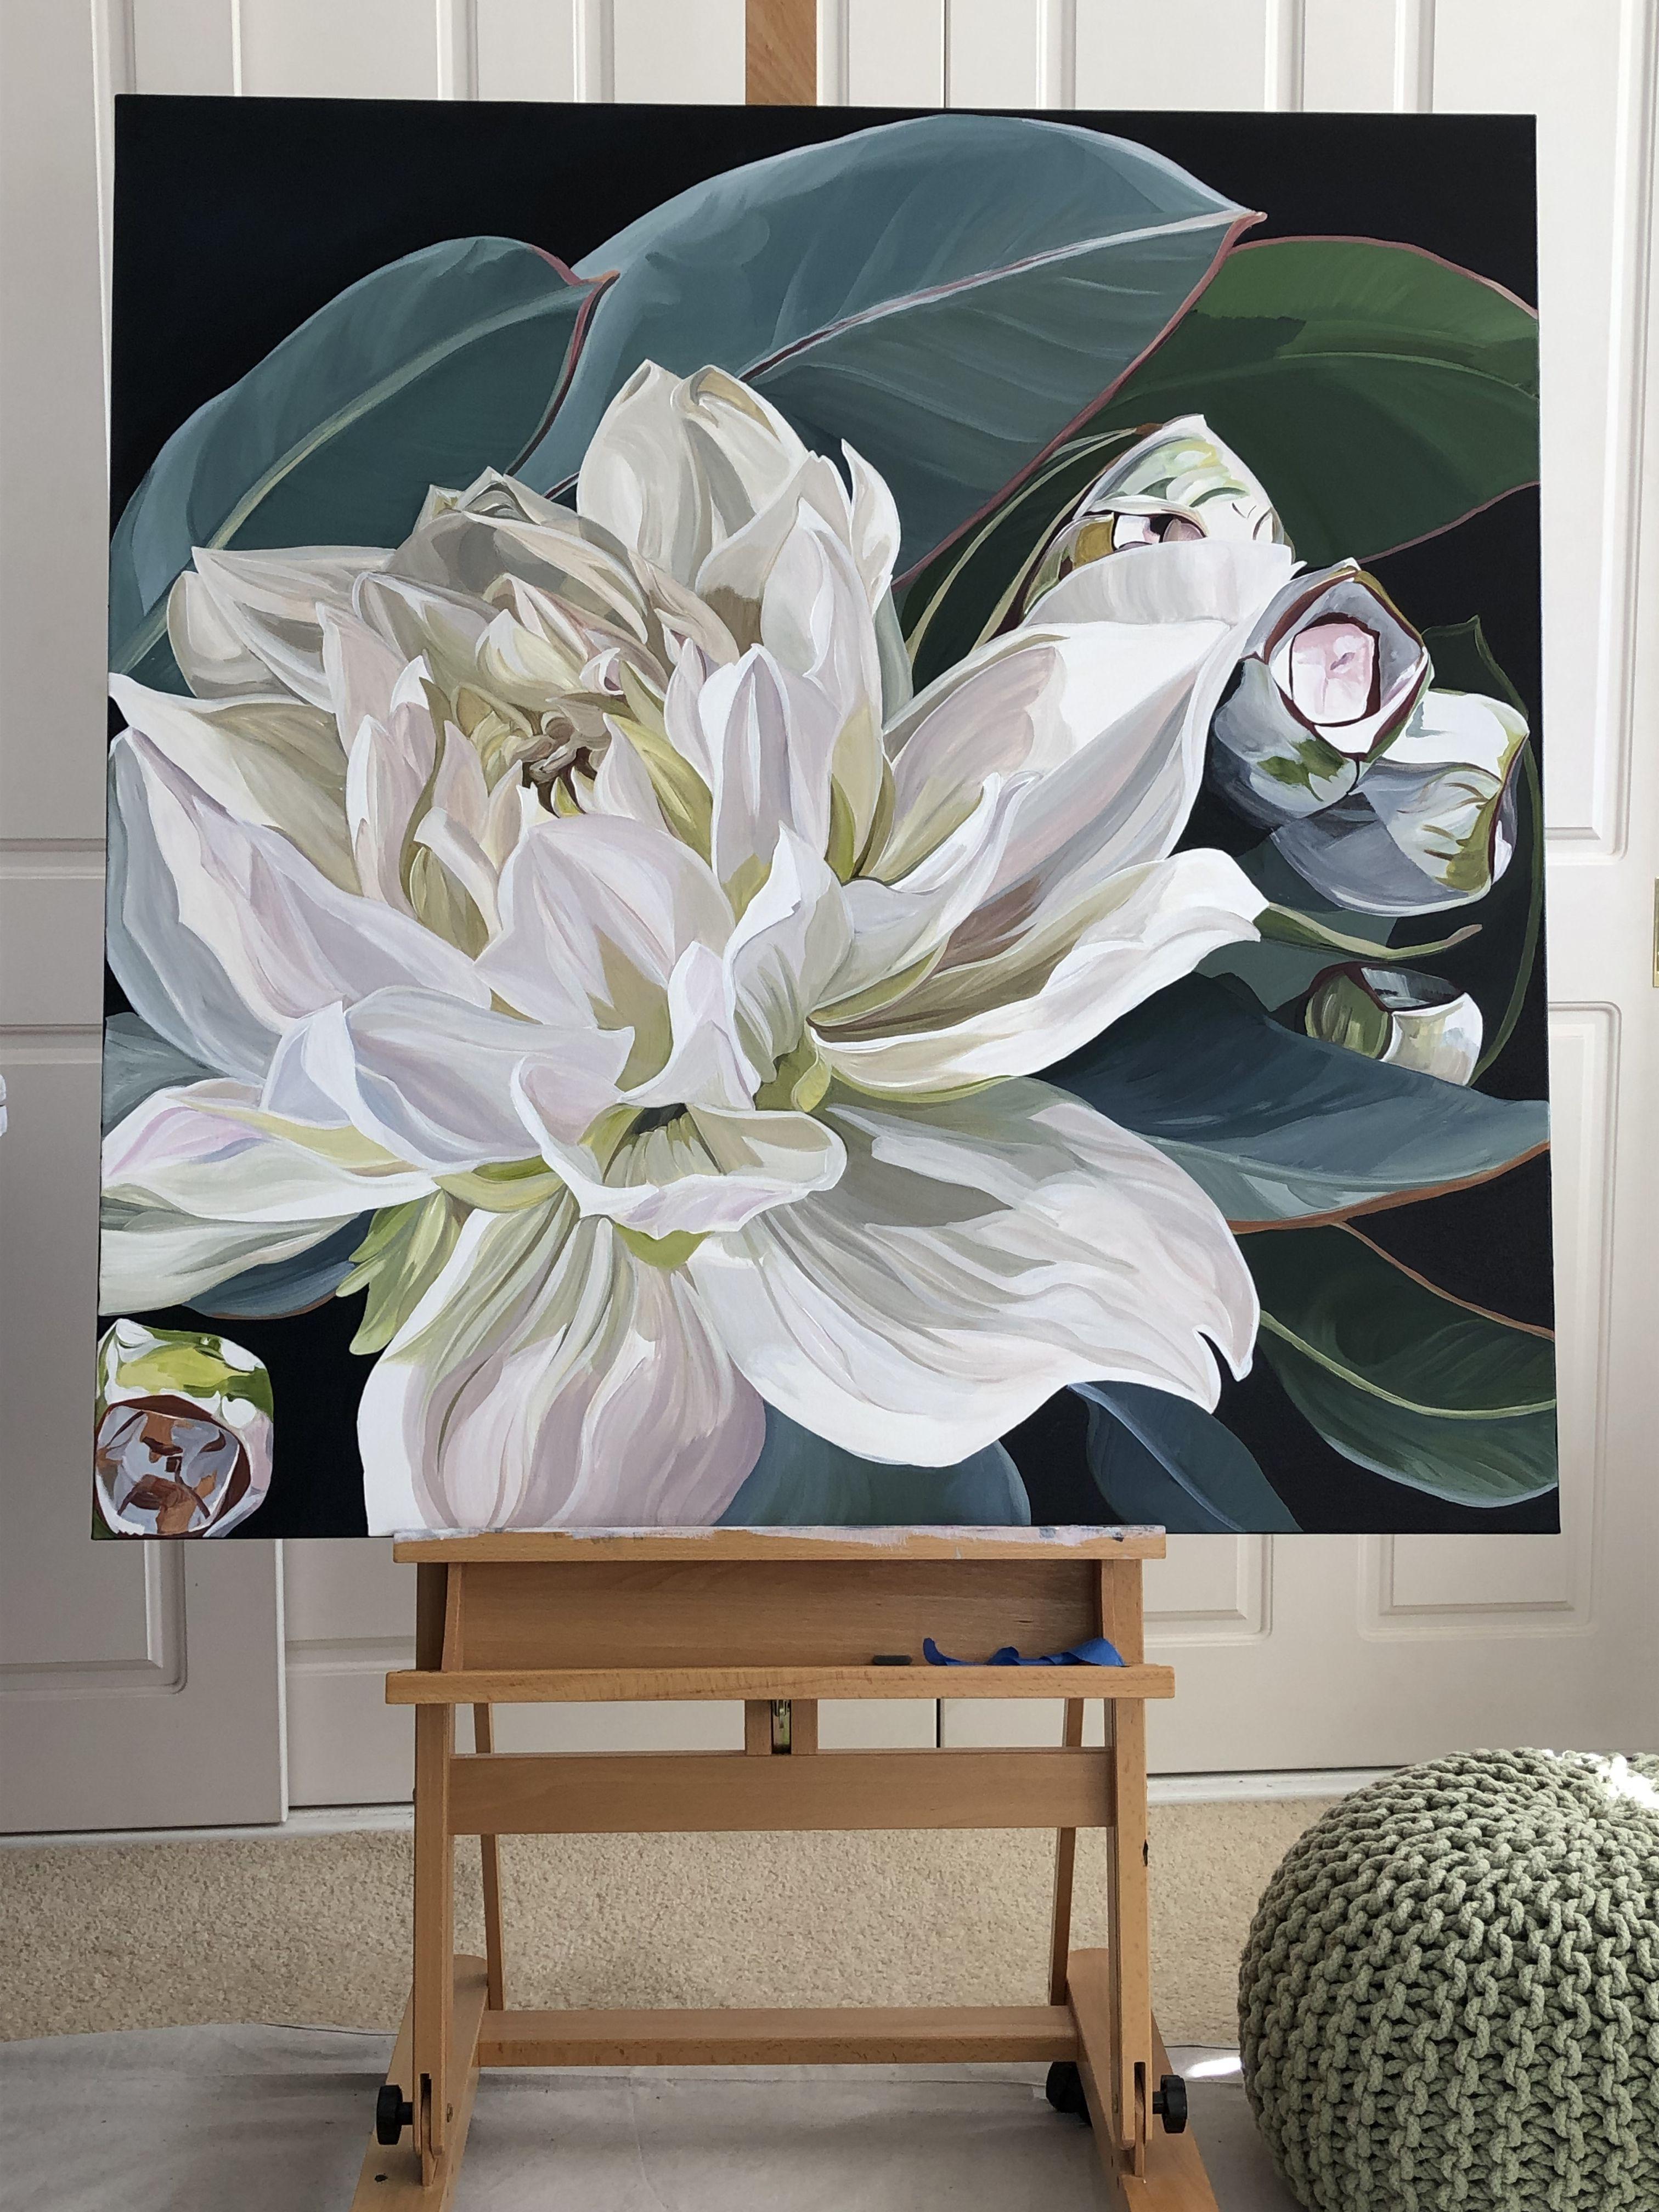 Details about  /Flower Bouquet Canvas Wall Art Pictures Home Deco Prints Oil Painting Re-Print